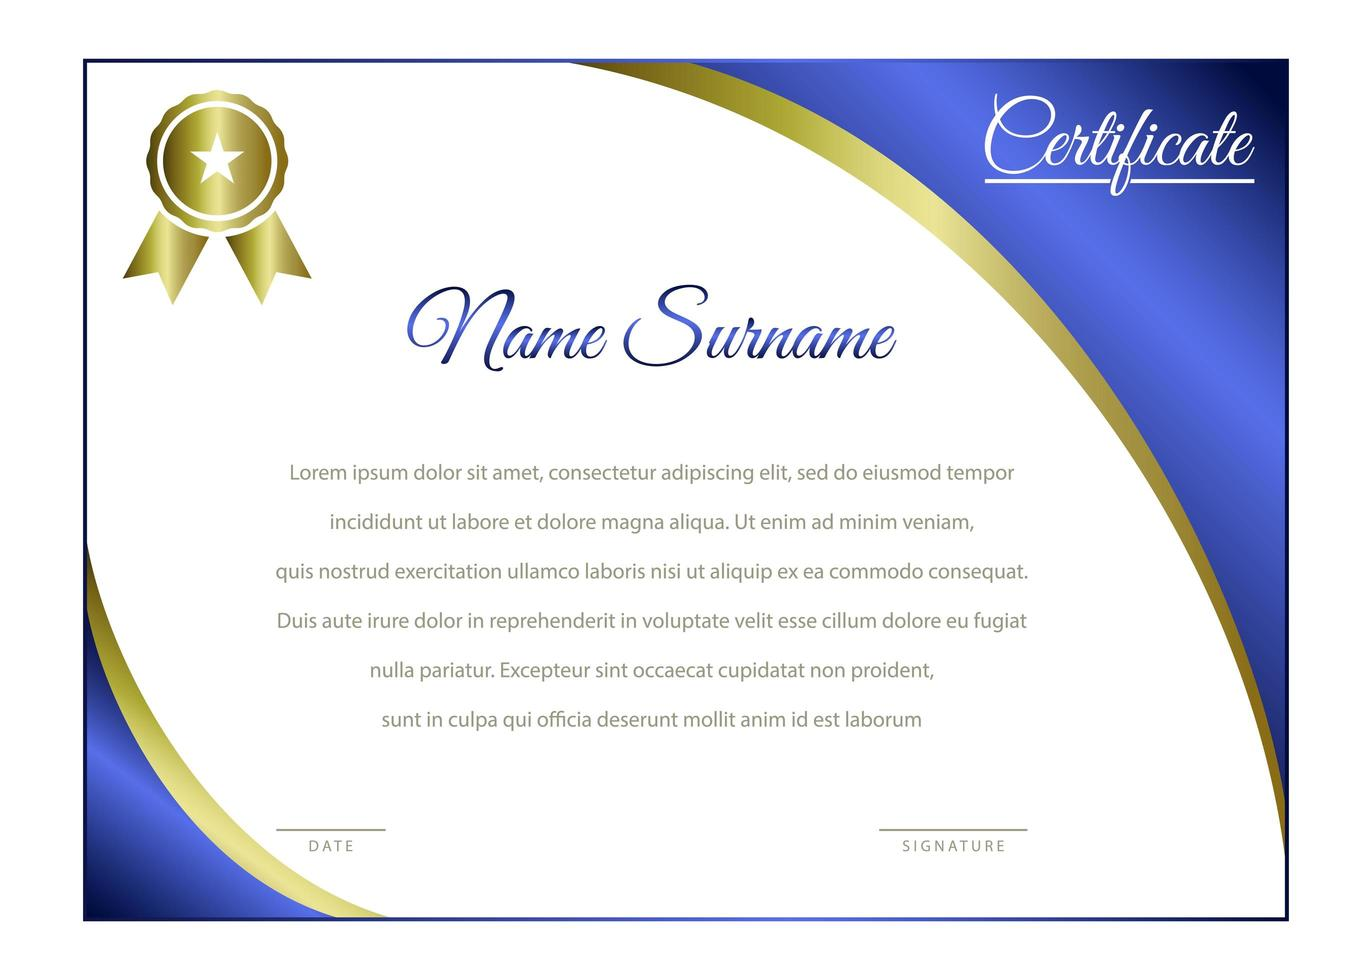 modelo de certificado horizontal azul e dourado elegante vetor